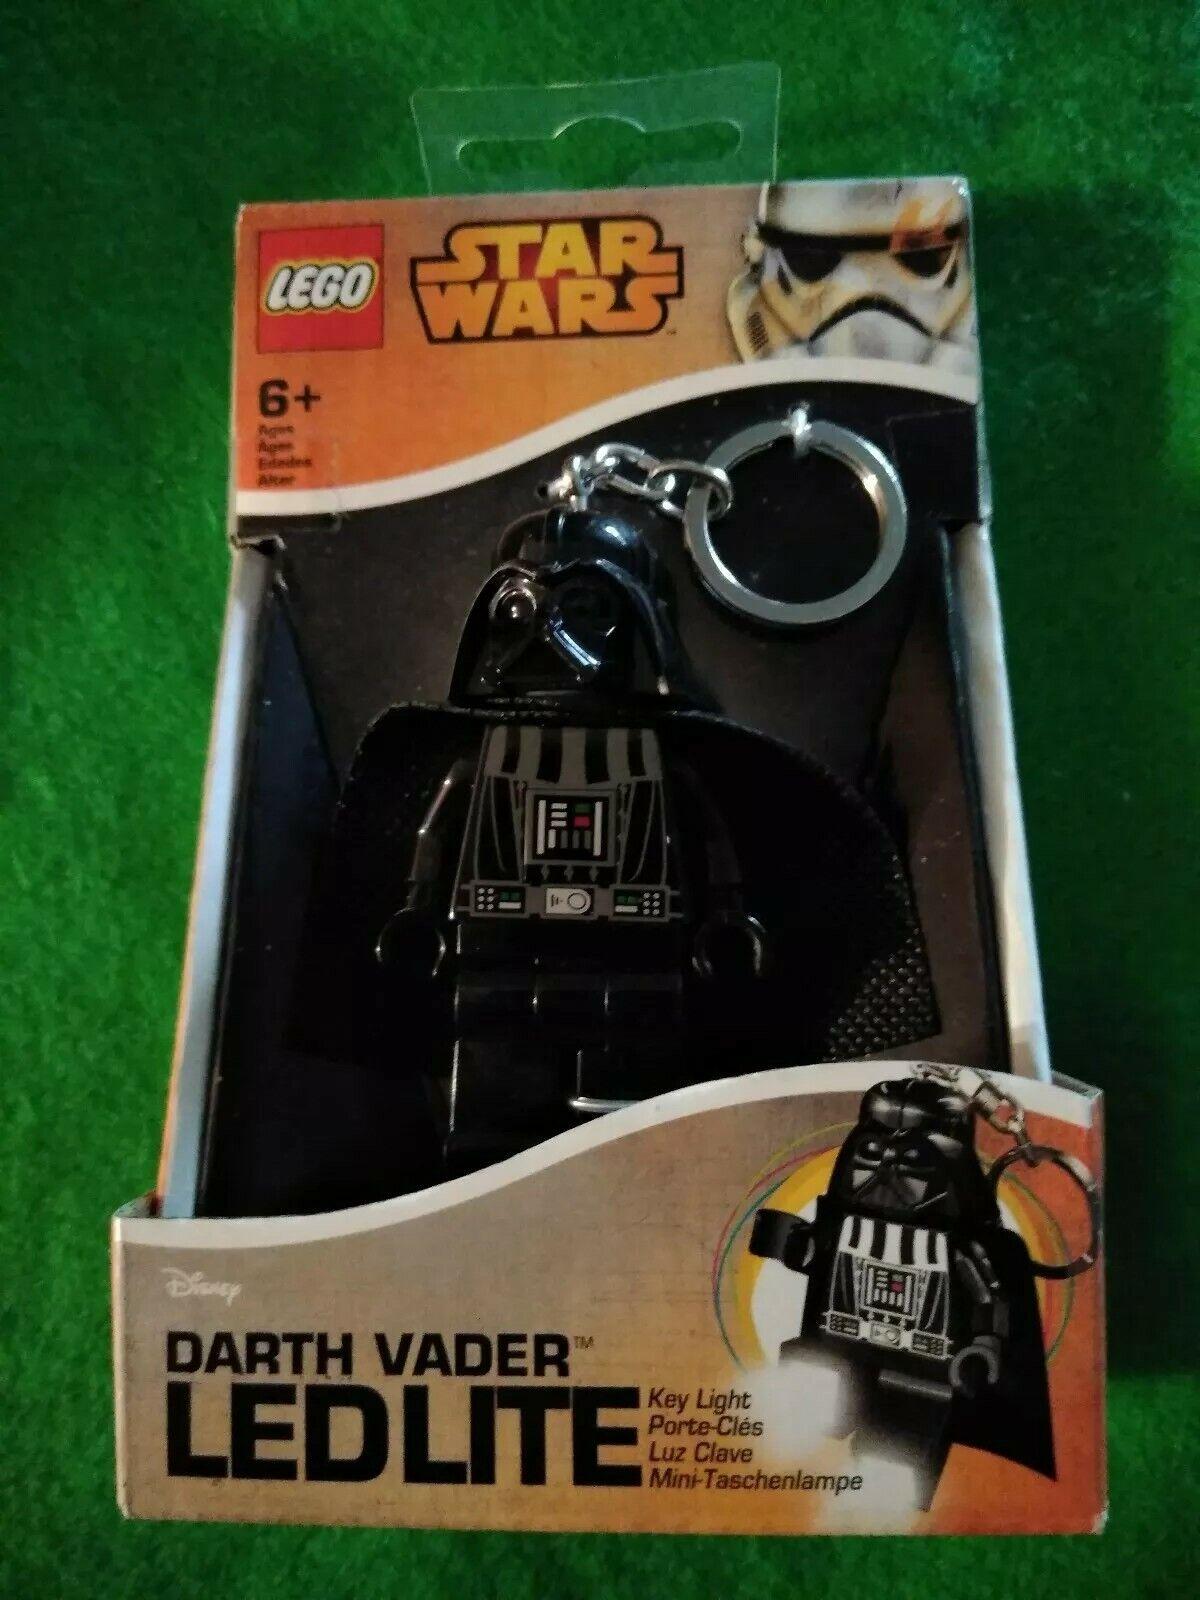 LEGO Star Wars - Darth Vader (LEDLITE LED LITE KEY CHAIN)